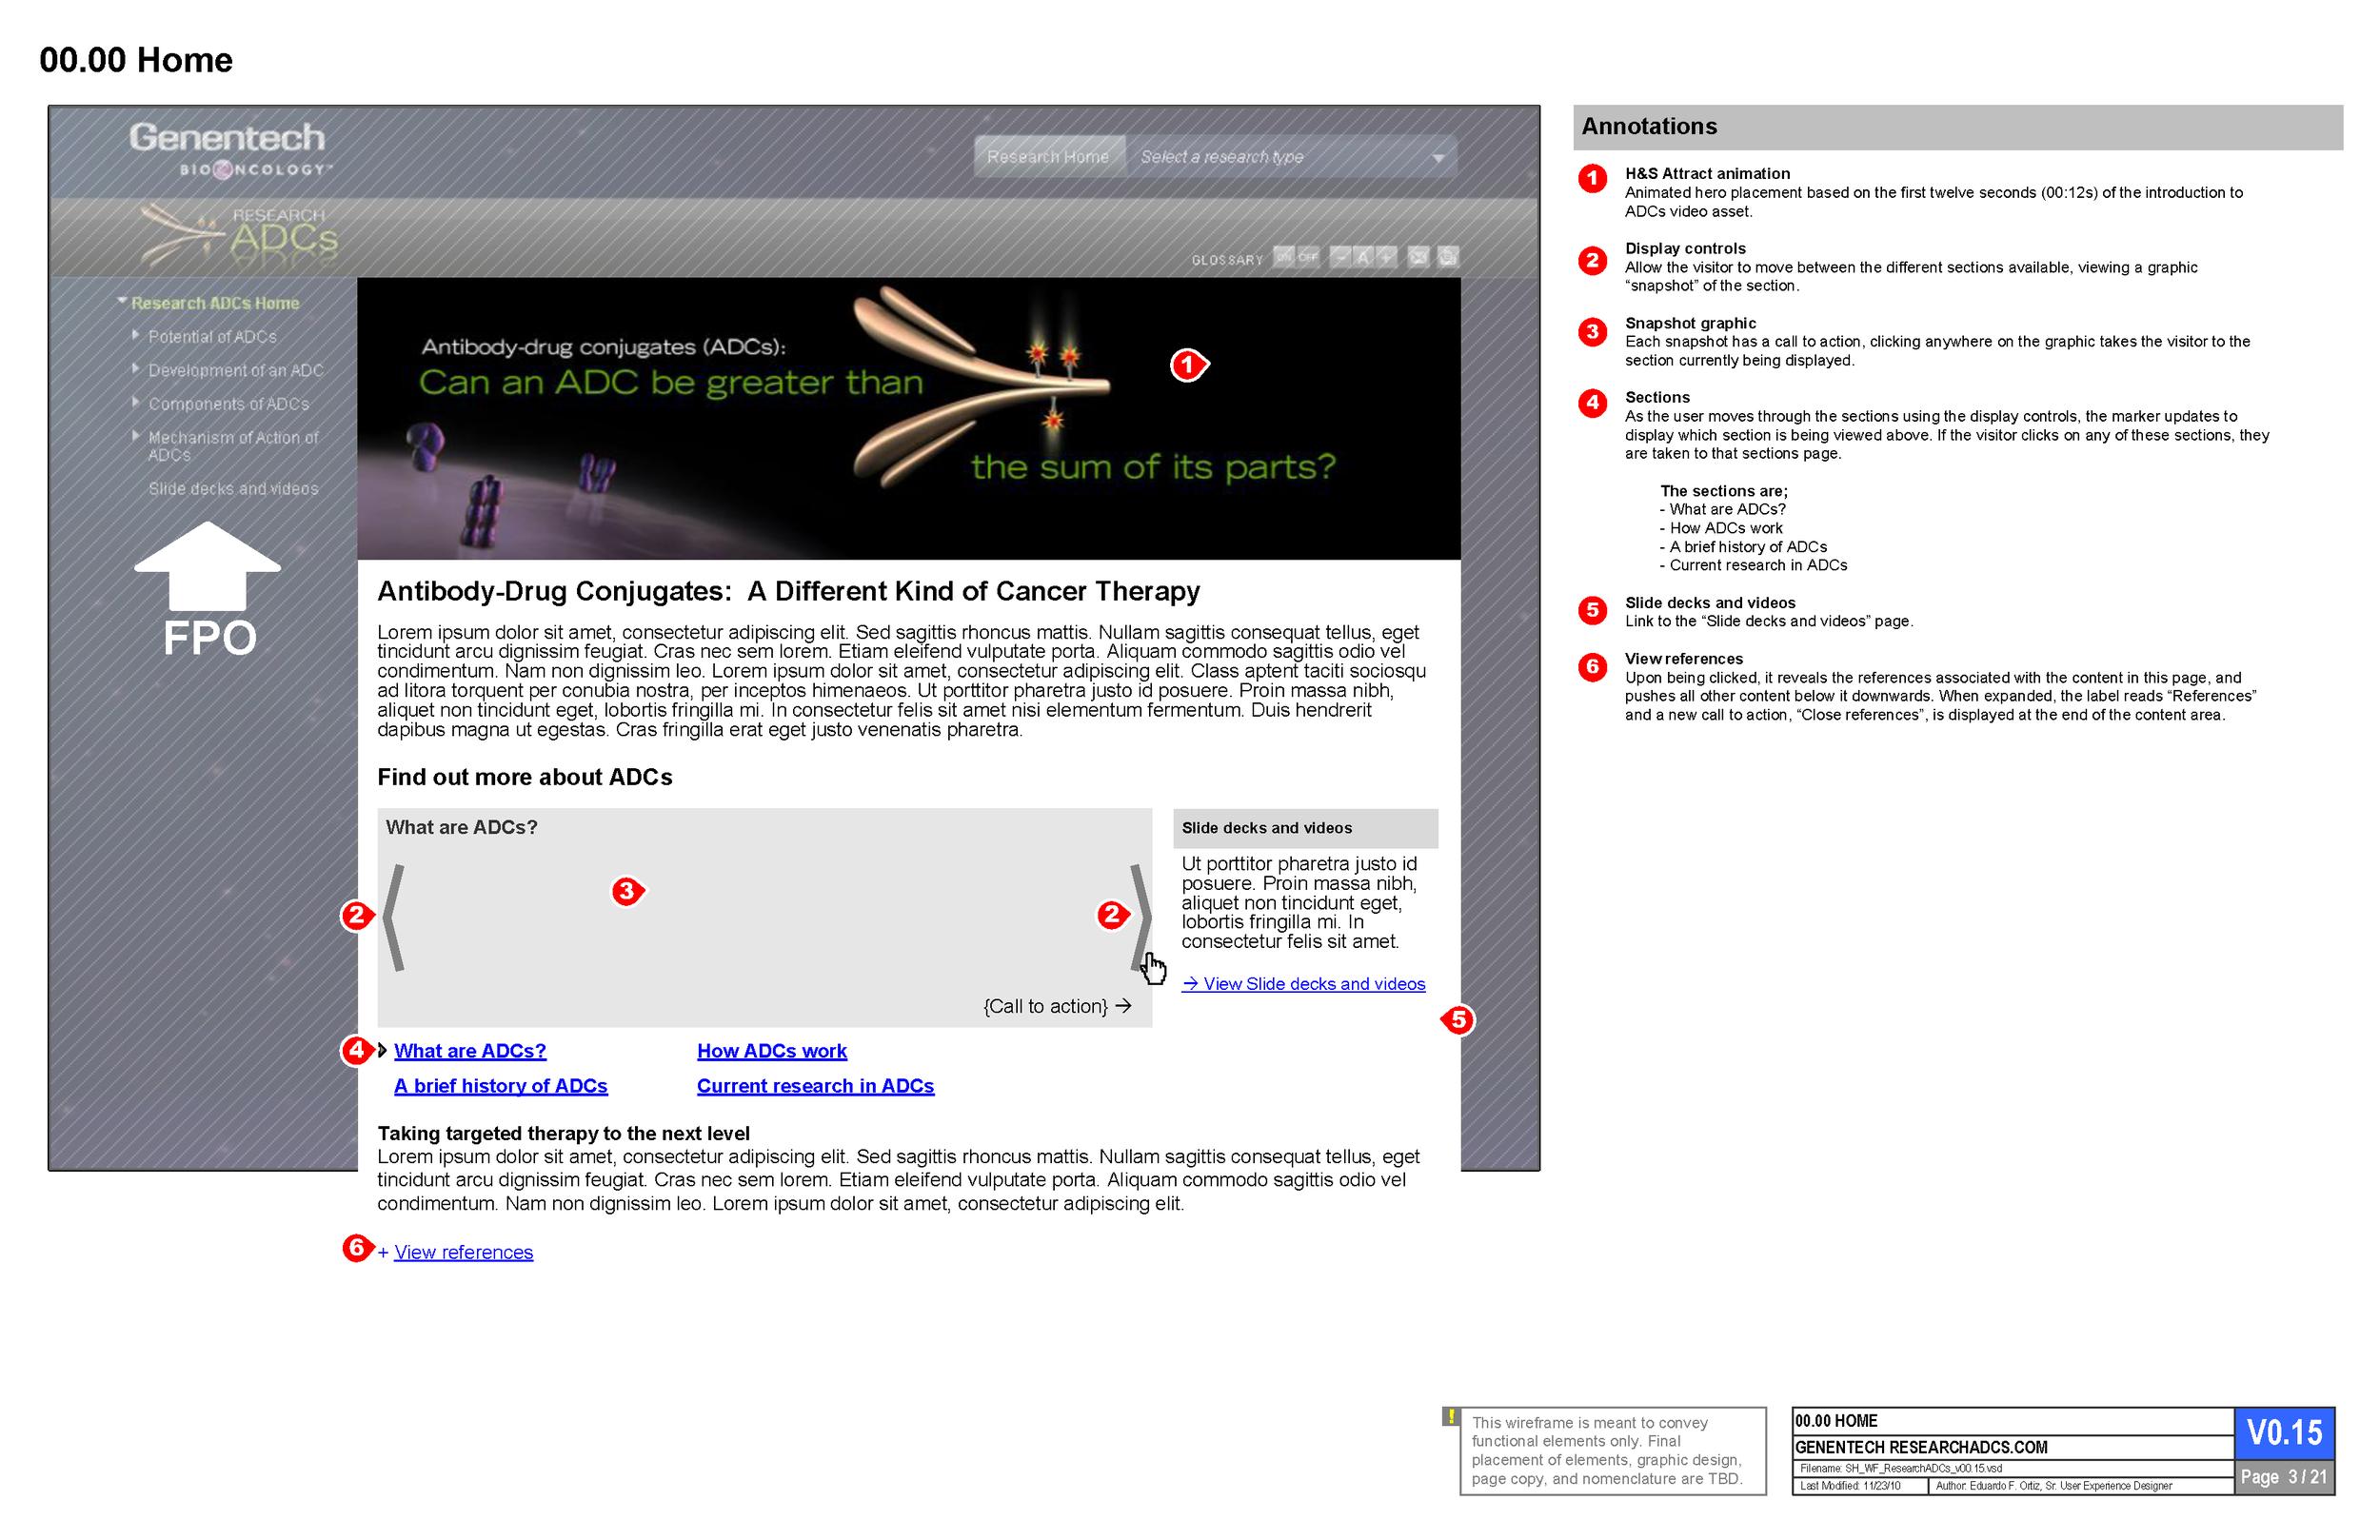 SH_WF_ResearchADCs_v00.15_Page_03.png